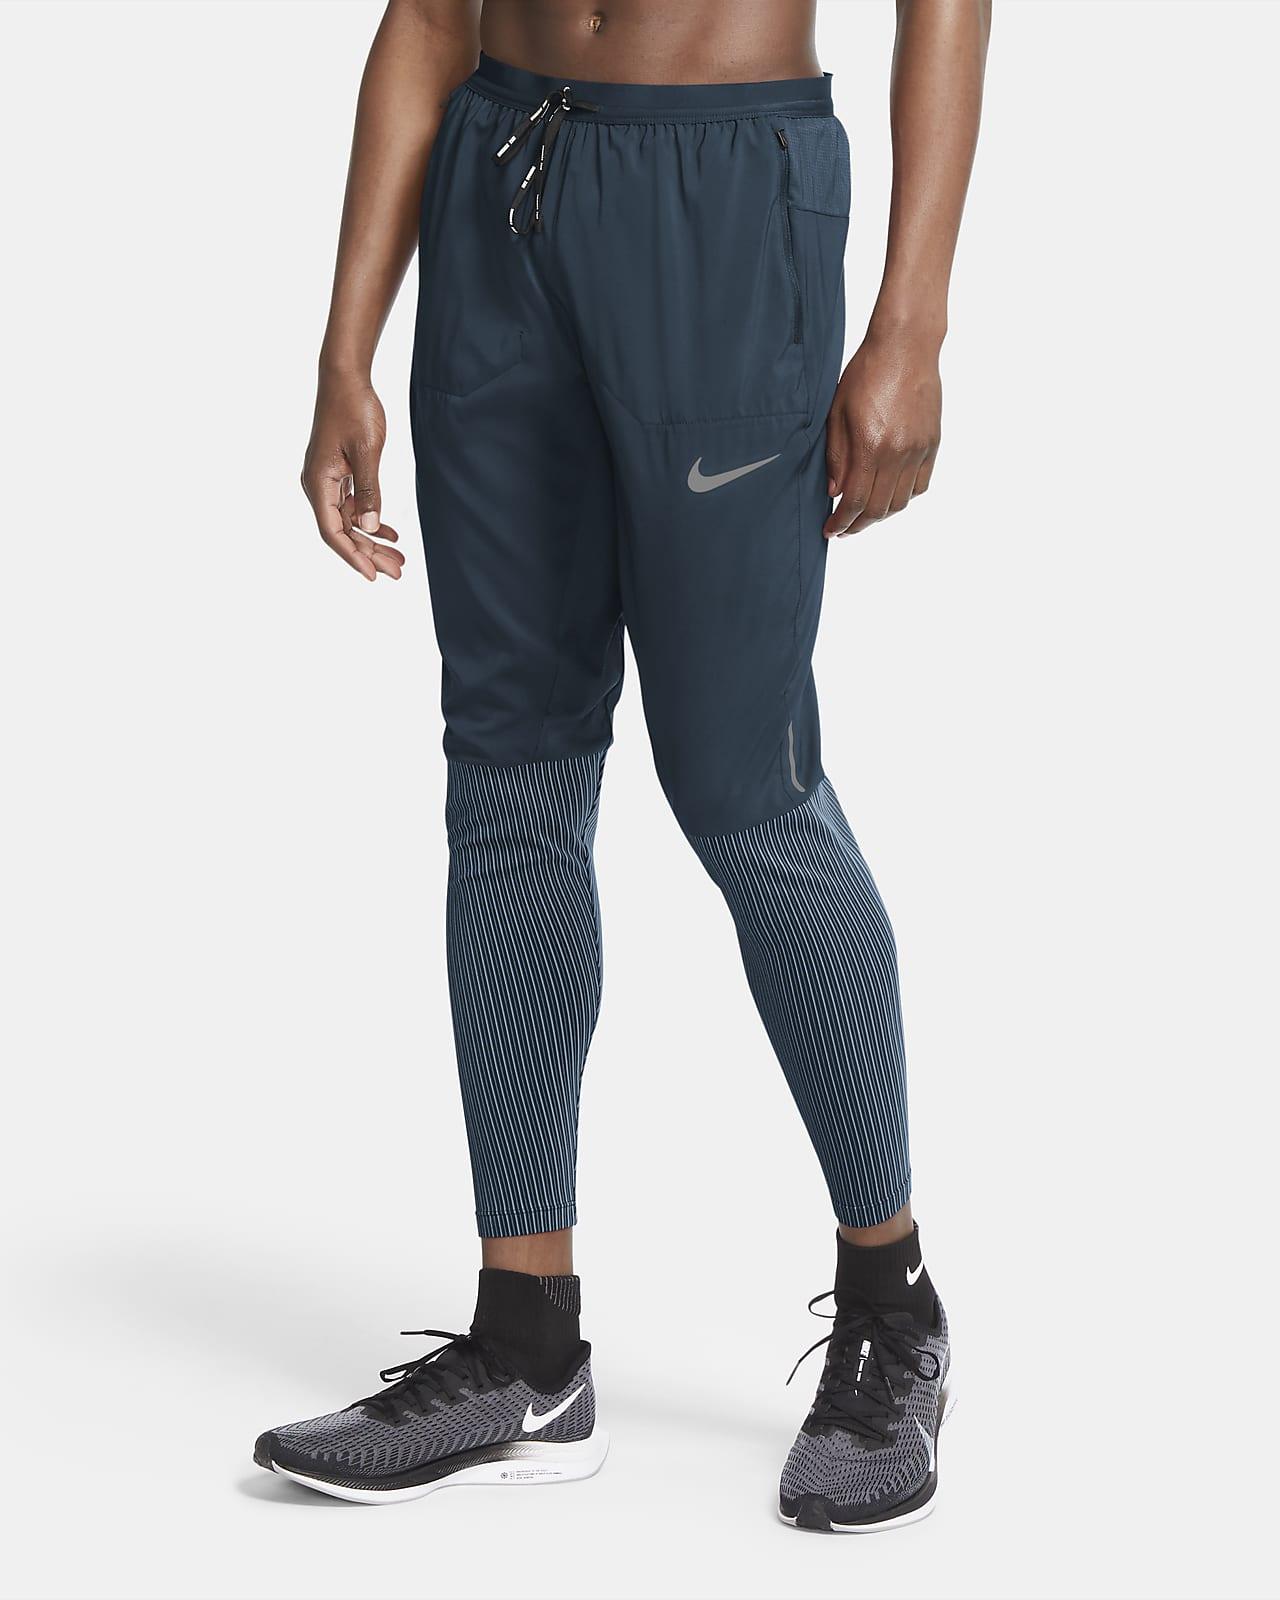 Nike Phenom Elite Future Fast Men's Hybrid Running Trousers